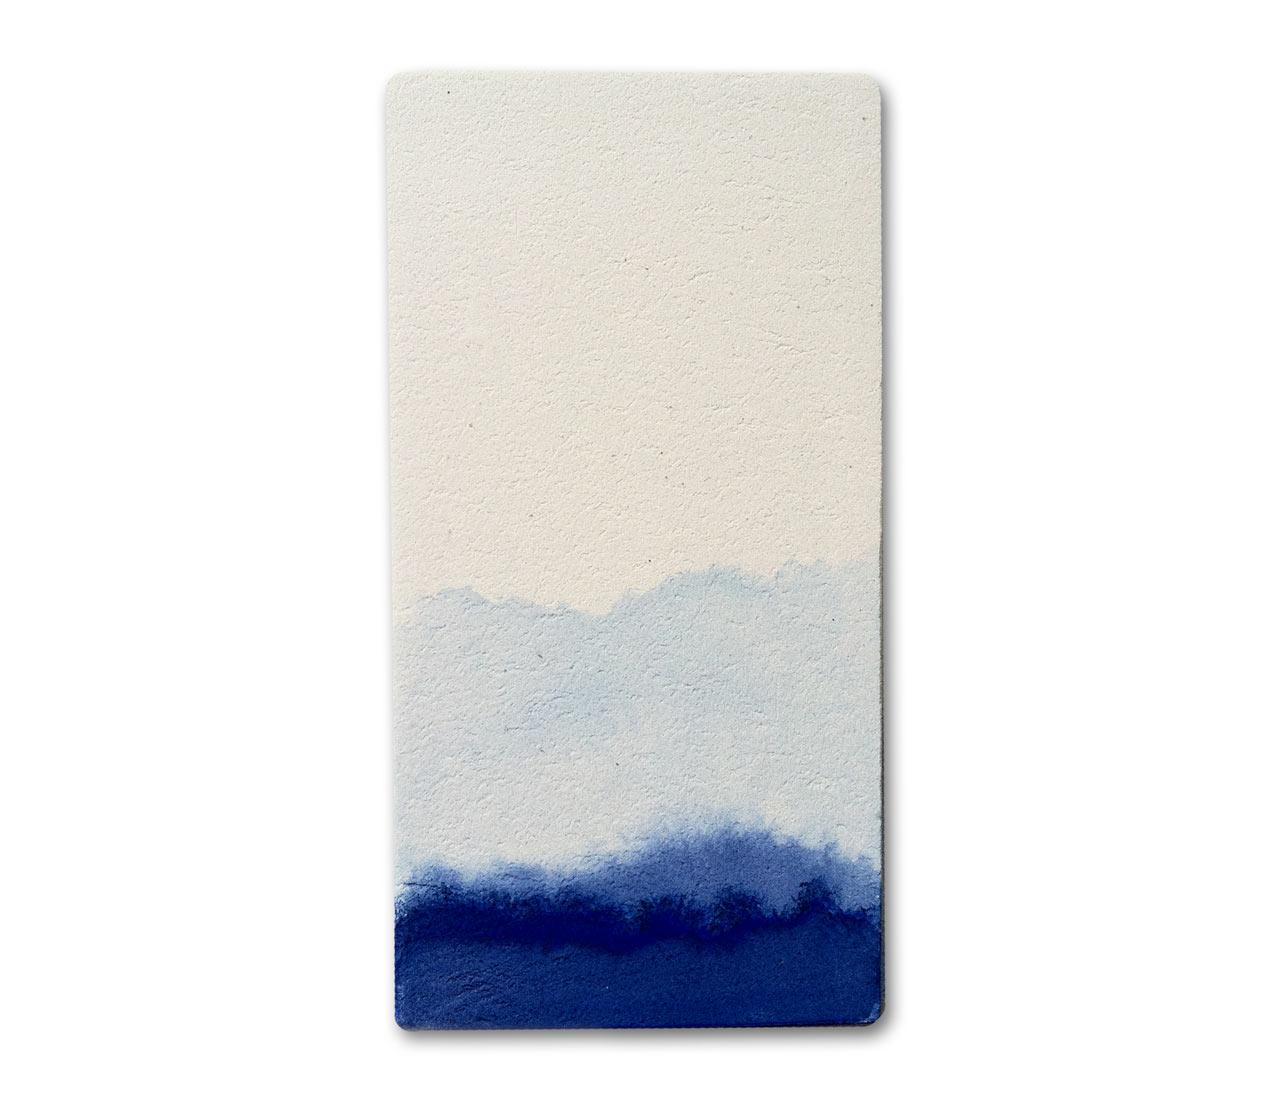 cle-Watermark-Tiles-Deborah-Osburn-Tilevera-4-indigo-dip